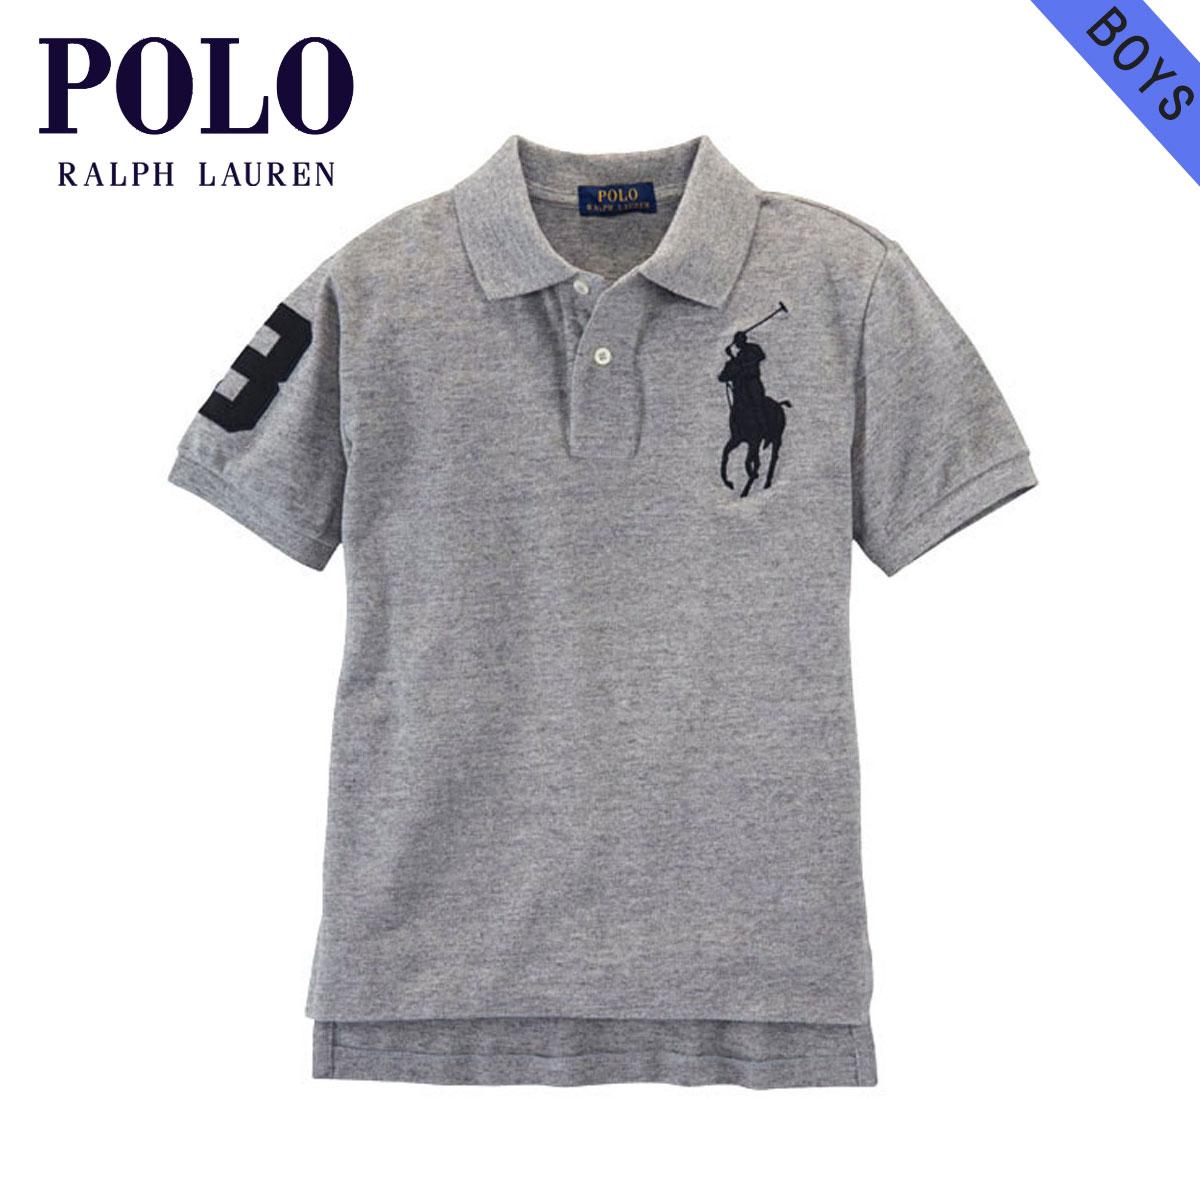 d913125f3c81 Polo Ralph Lauren kids POLO RALPH LAUREN CHILDREN regular article children s  clothes boys polo shirt BIG PONY COTTON POLO SHIRT 65353776 D00S15